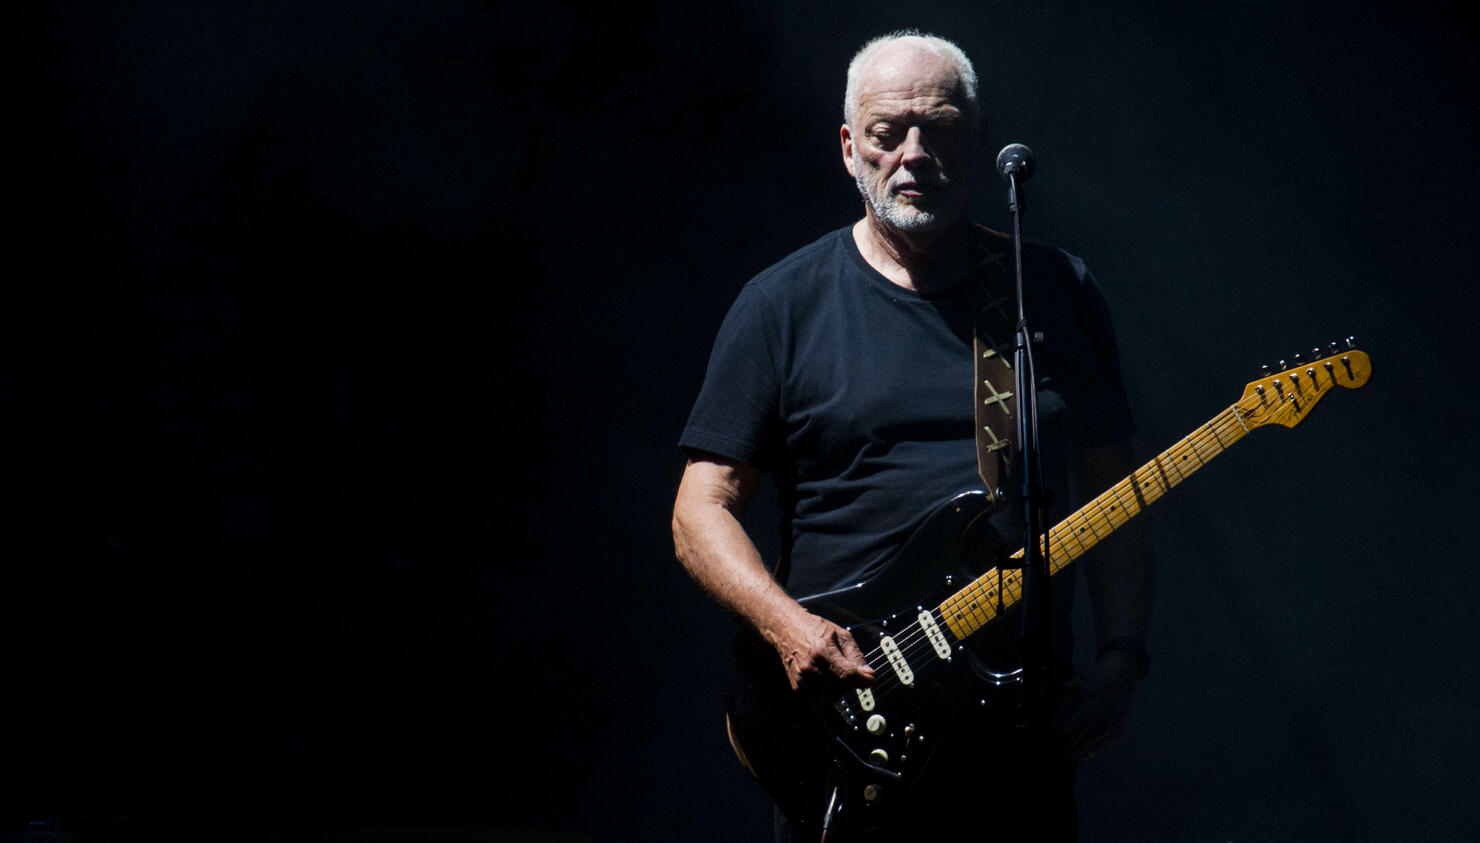 David Gilmour Performs At Circo Massimo